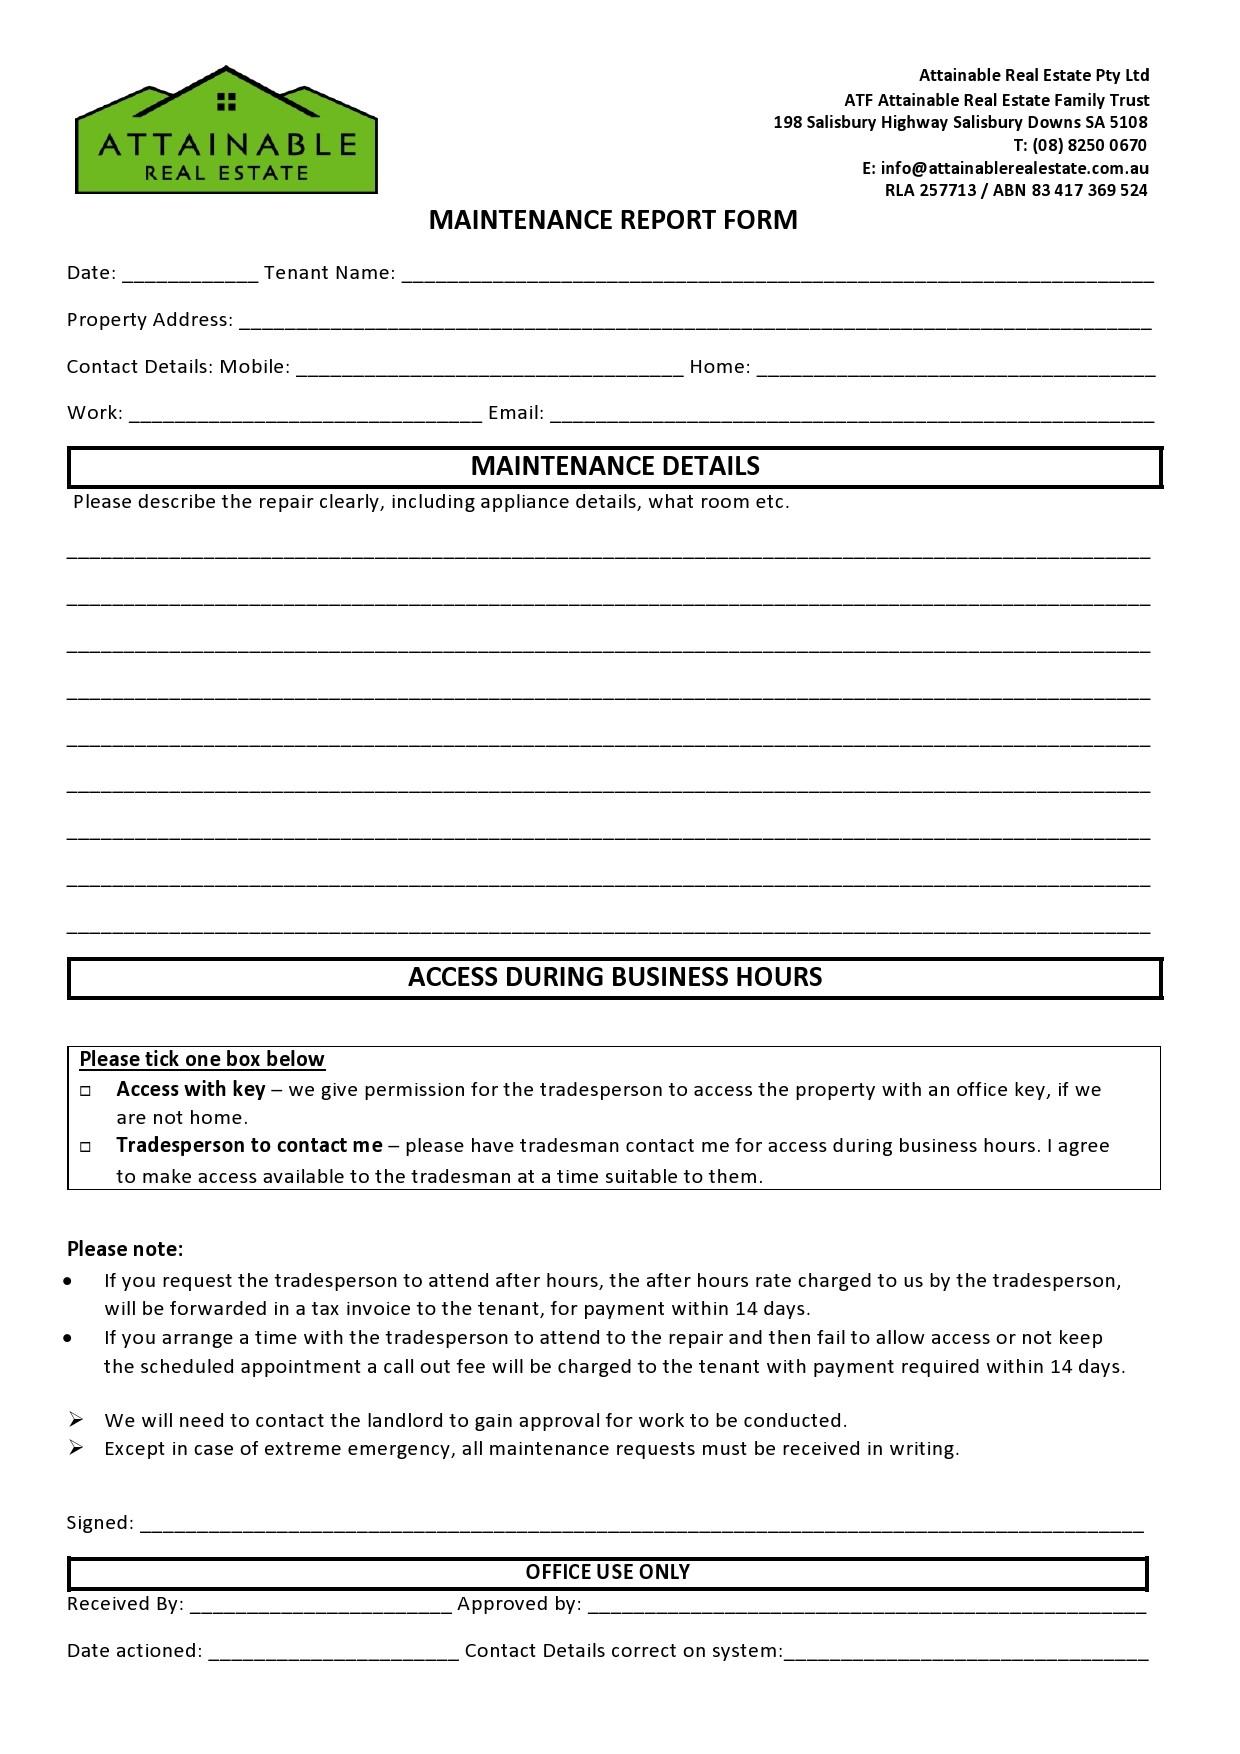 Free maintenance report form 23